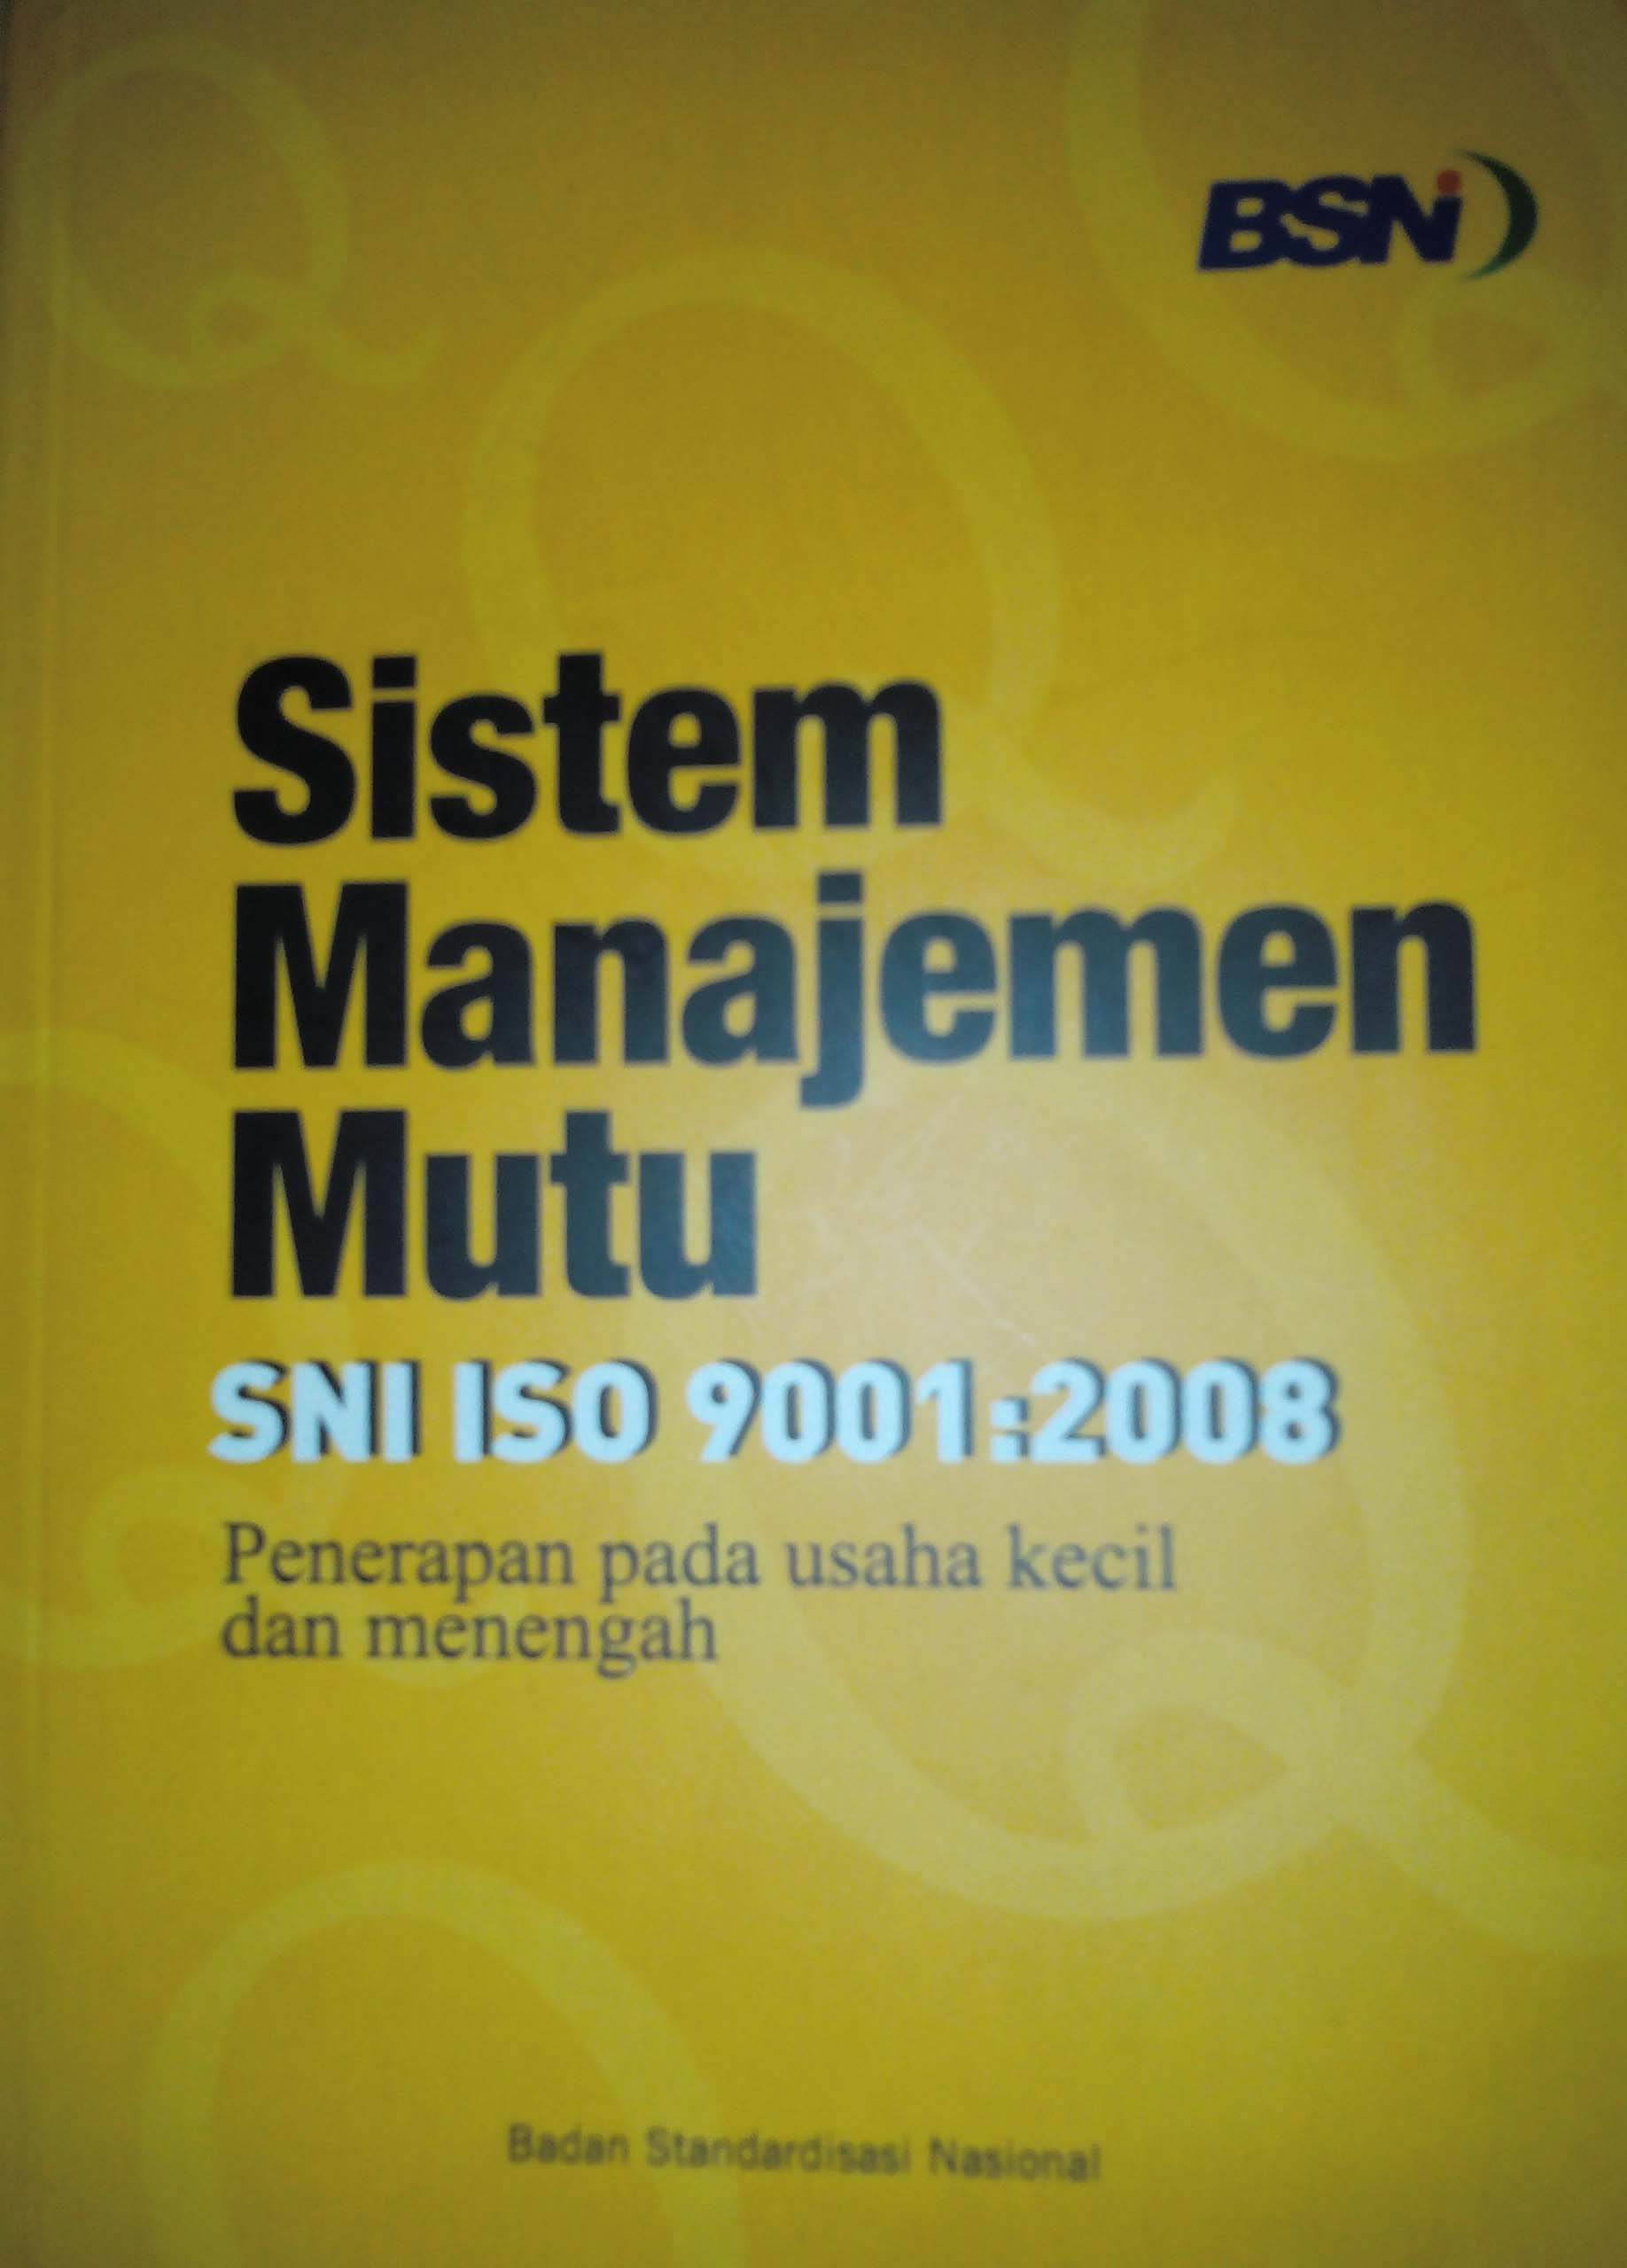 SNI ISO 9001:2008